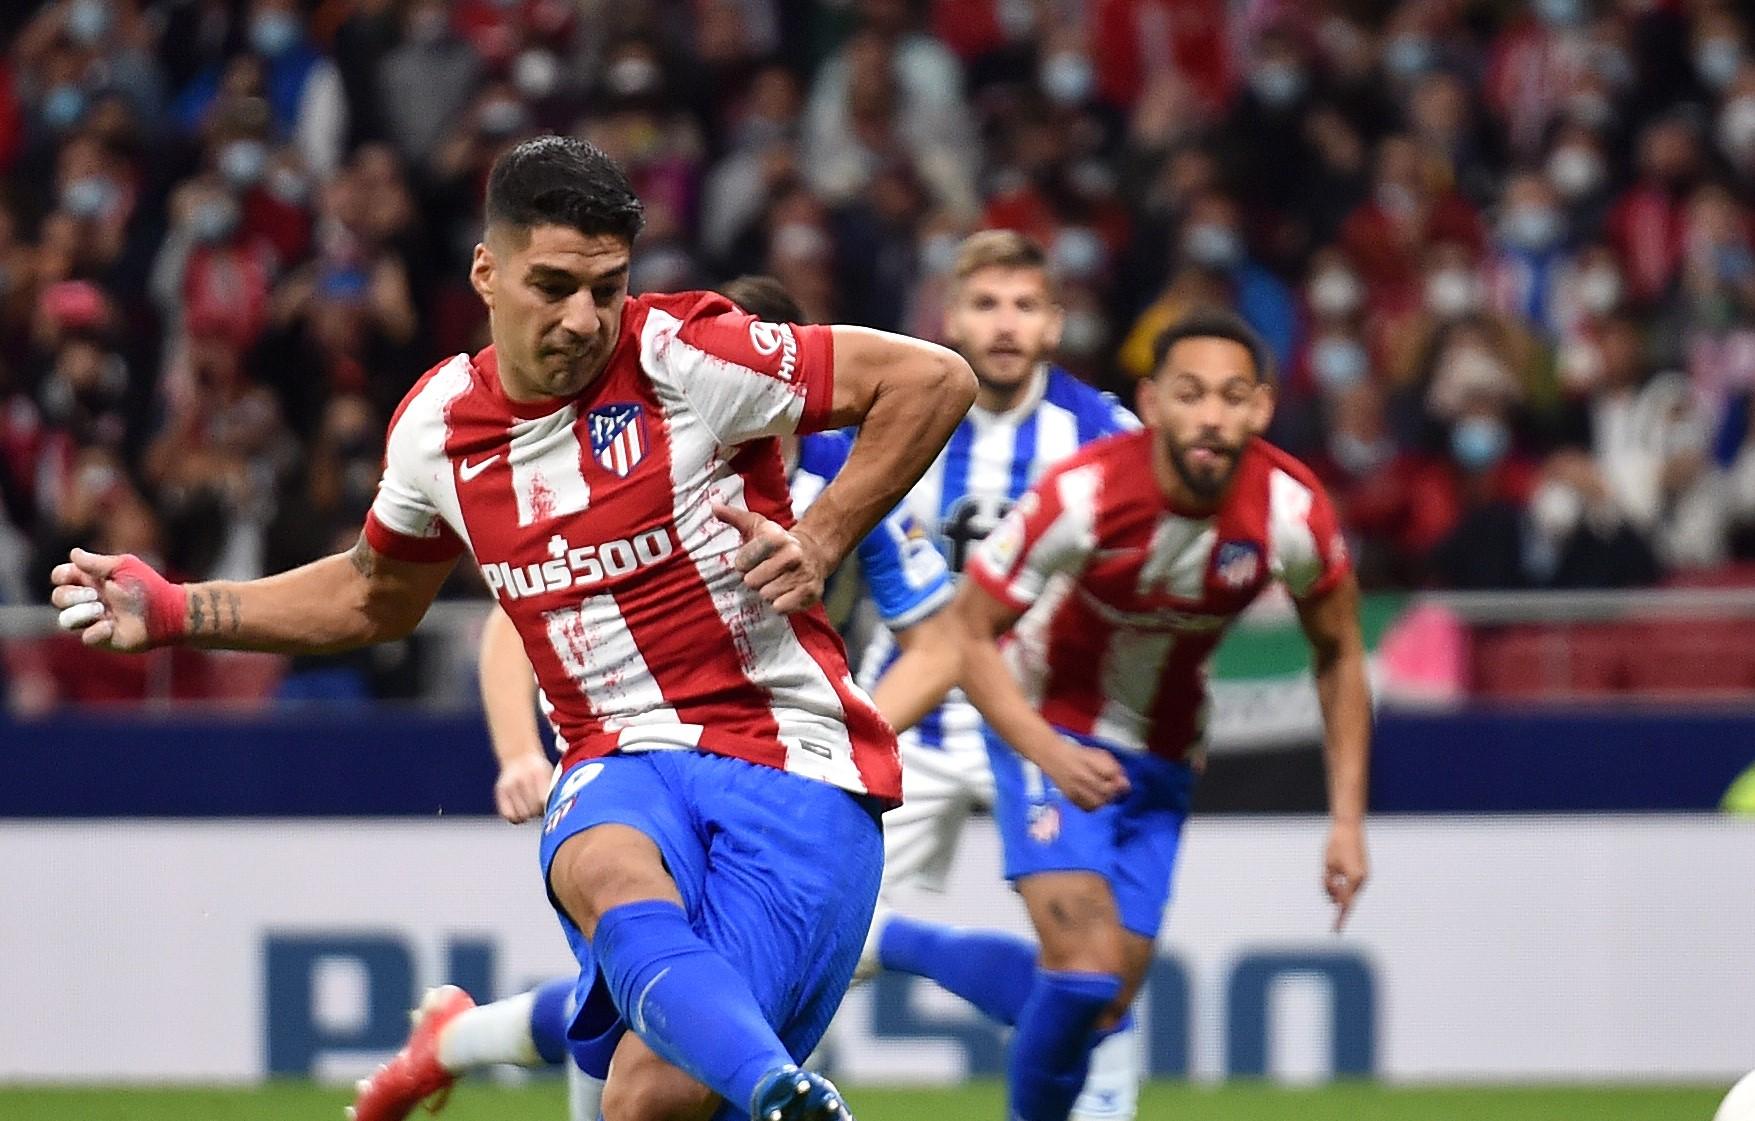 Mikel Merino laments penalty decision during Atletico Madrid vs Real Sociedad